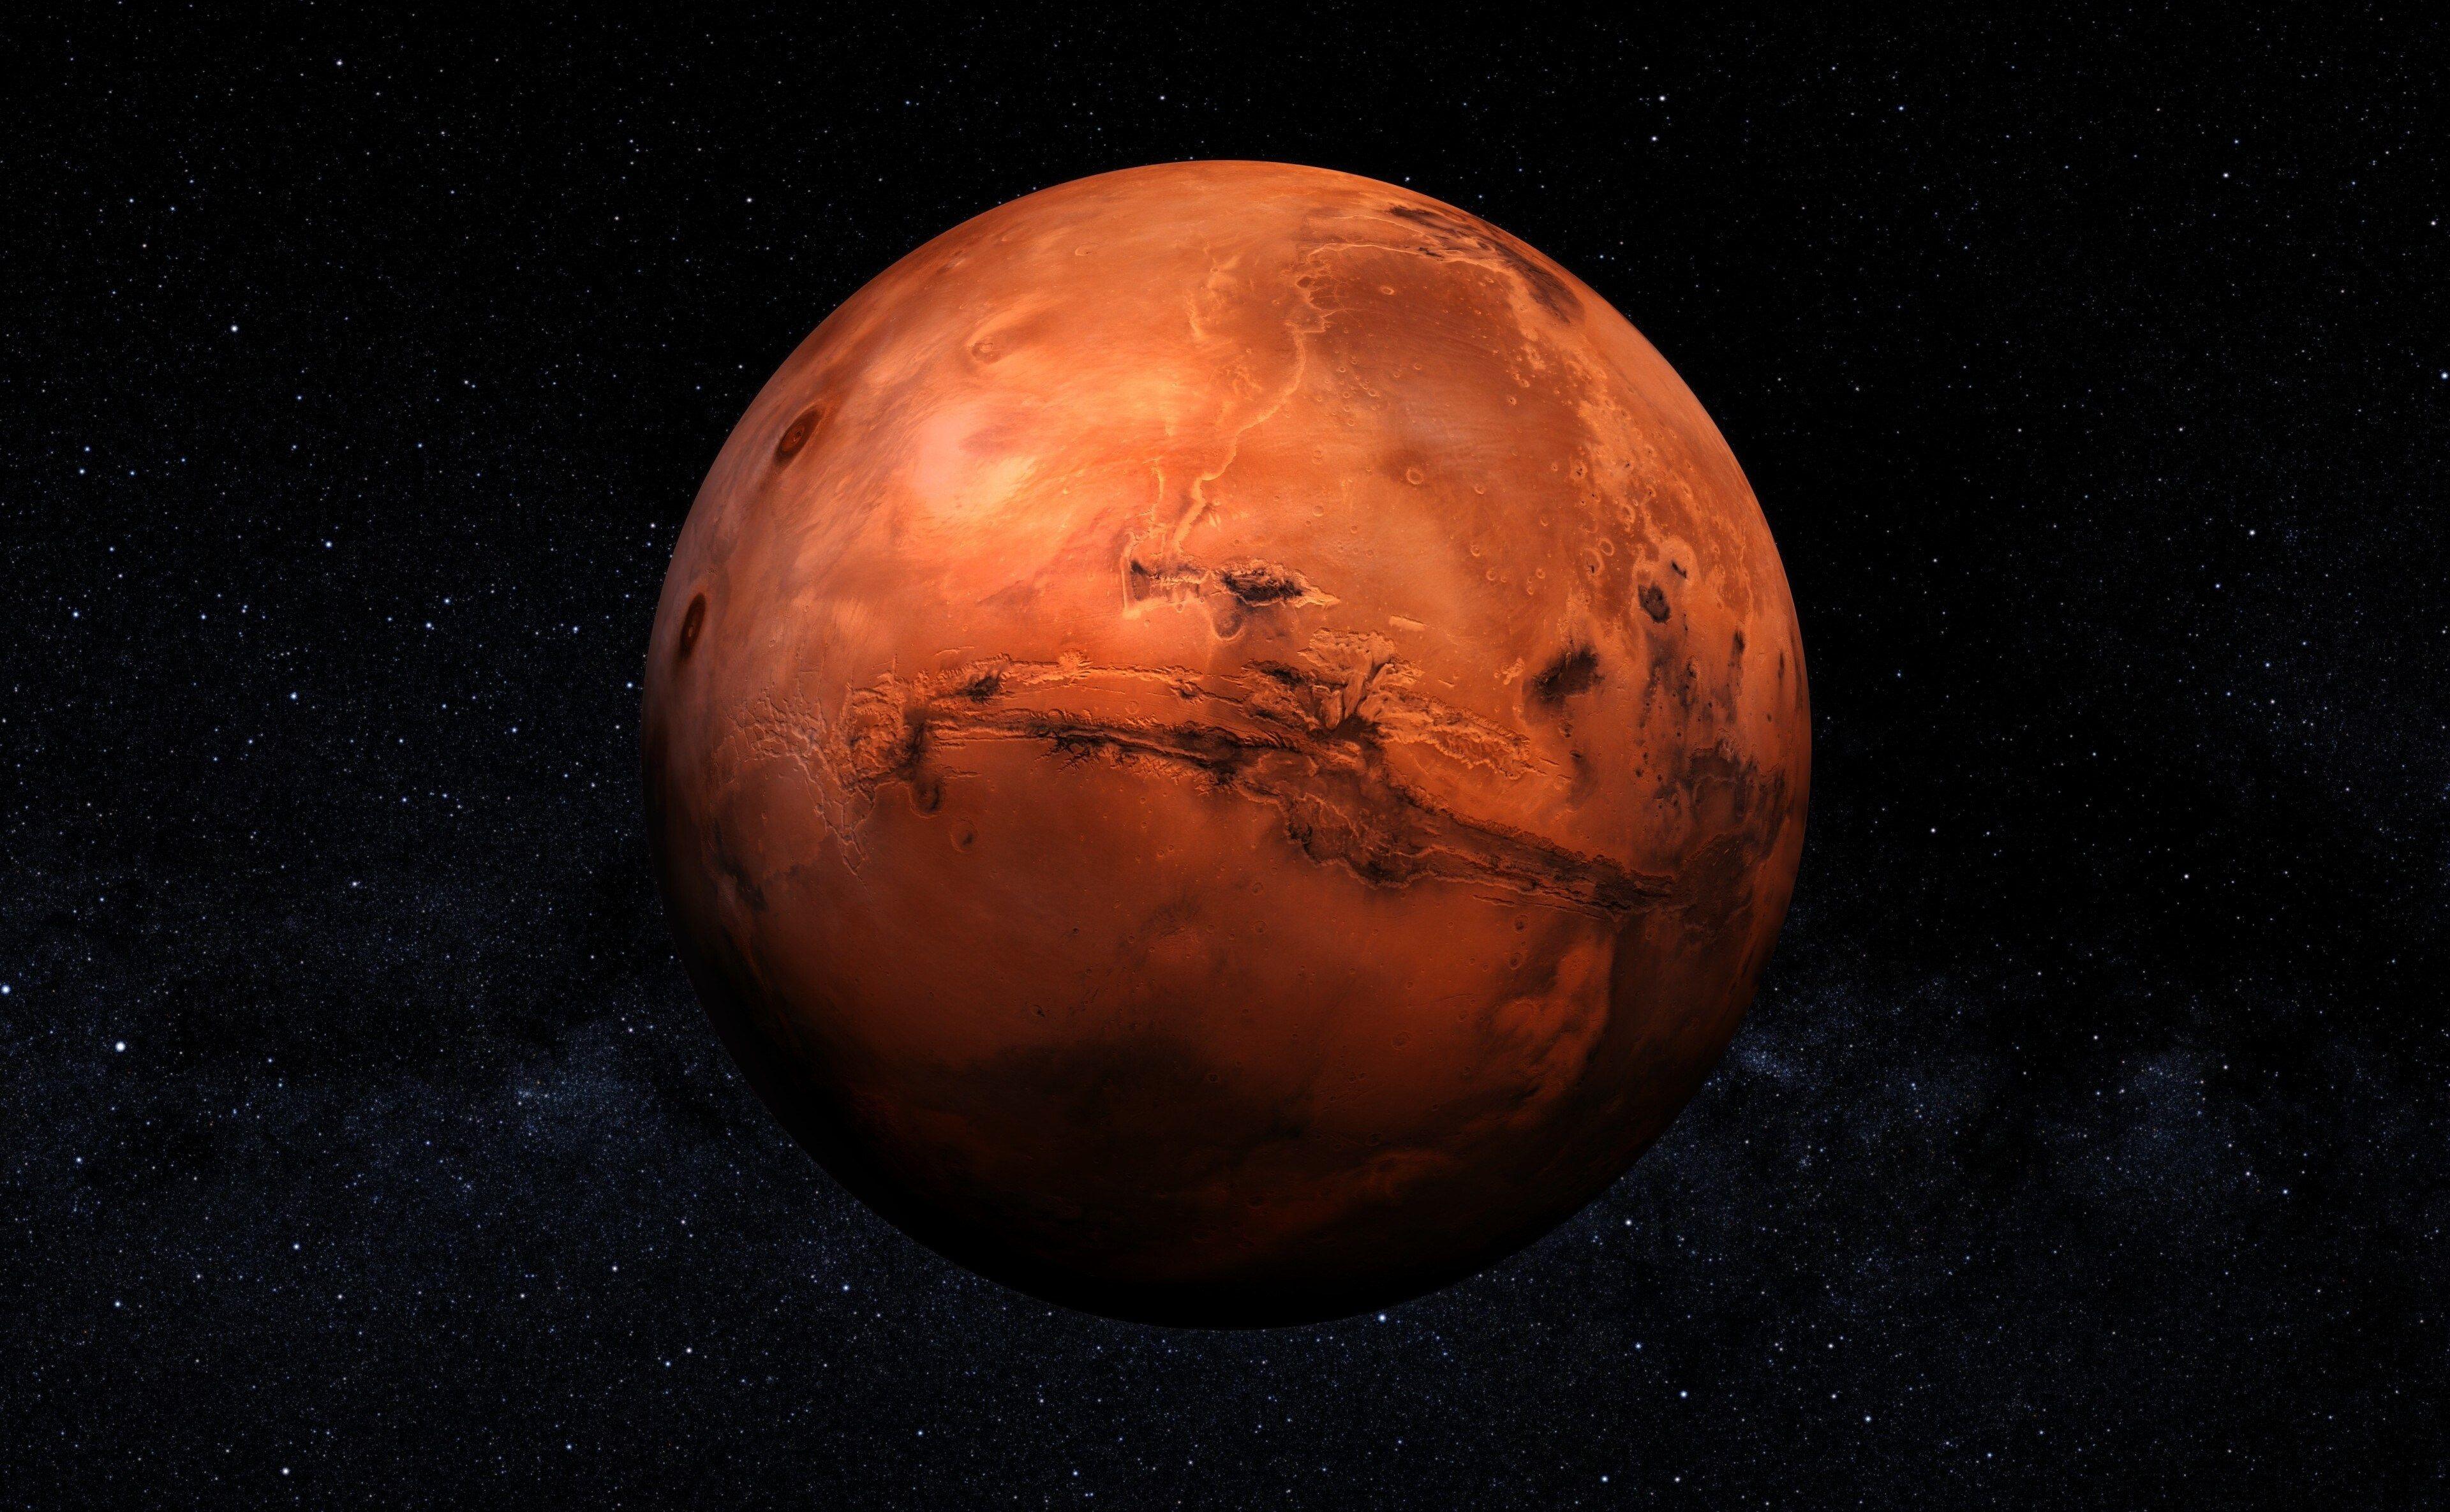 3840x2370 Mars 4k Full Screen Wallpaper For Desktop Mars Wallpaper Mars Planet Planets